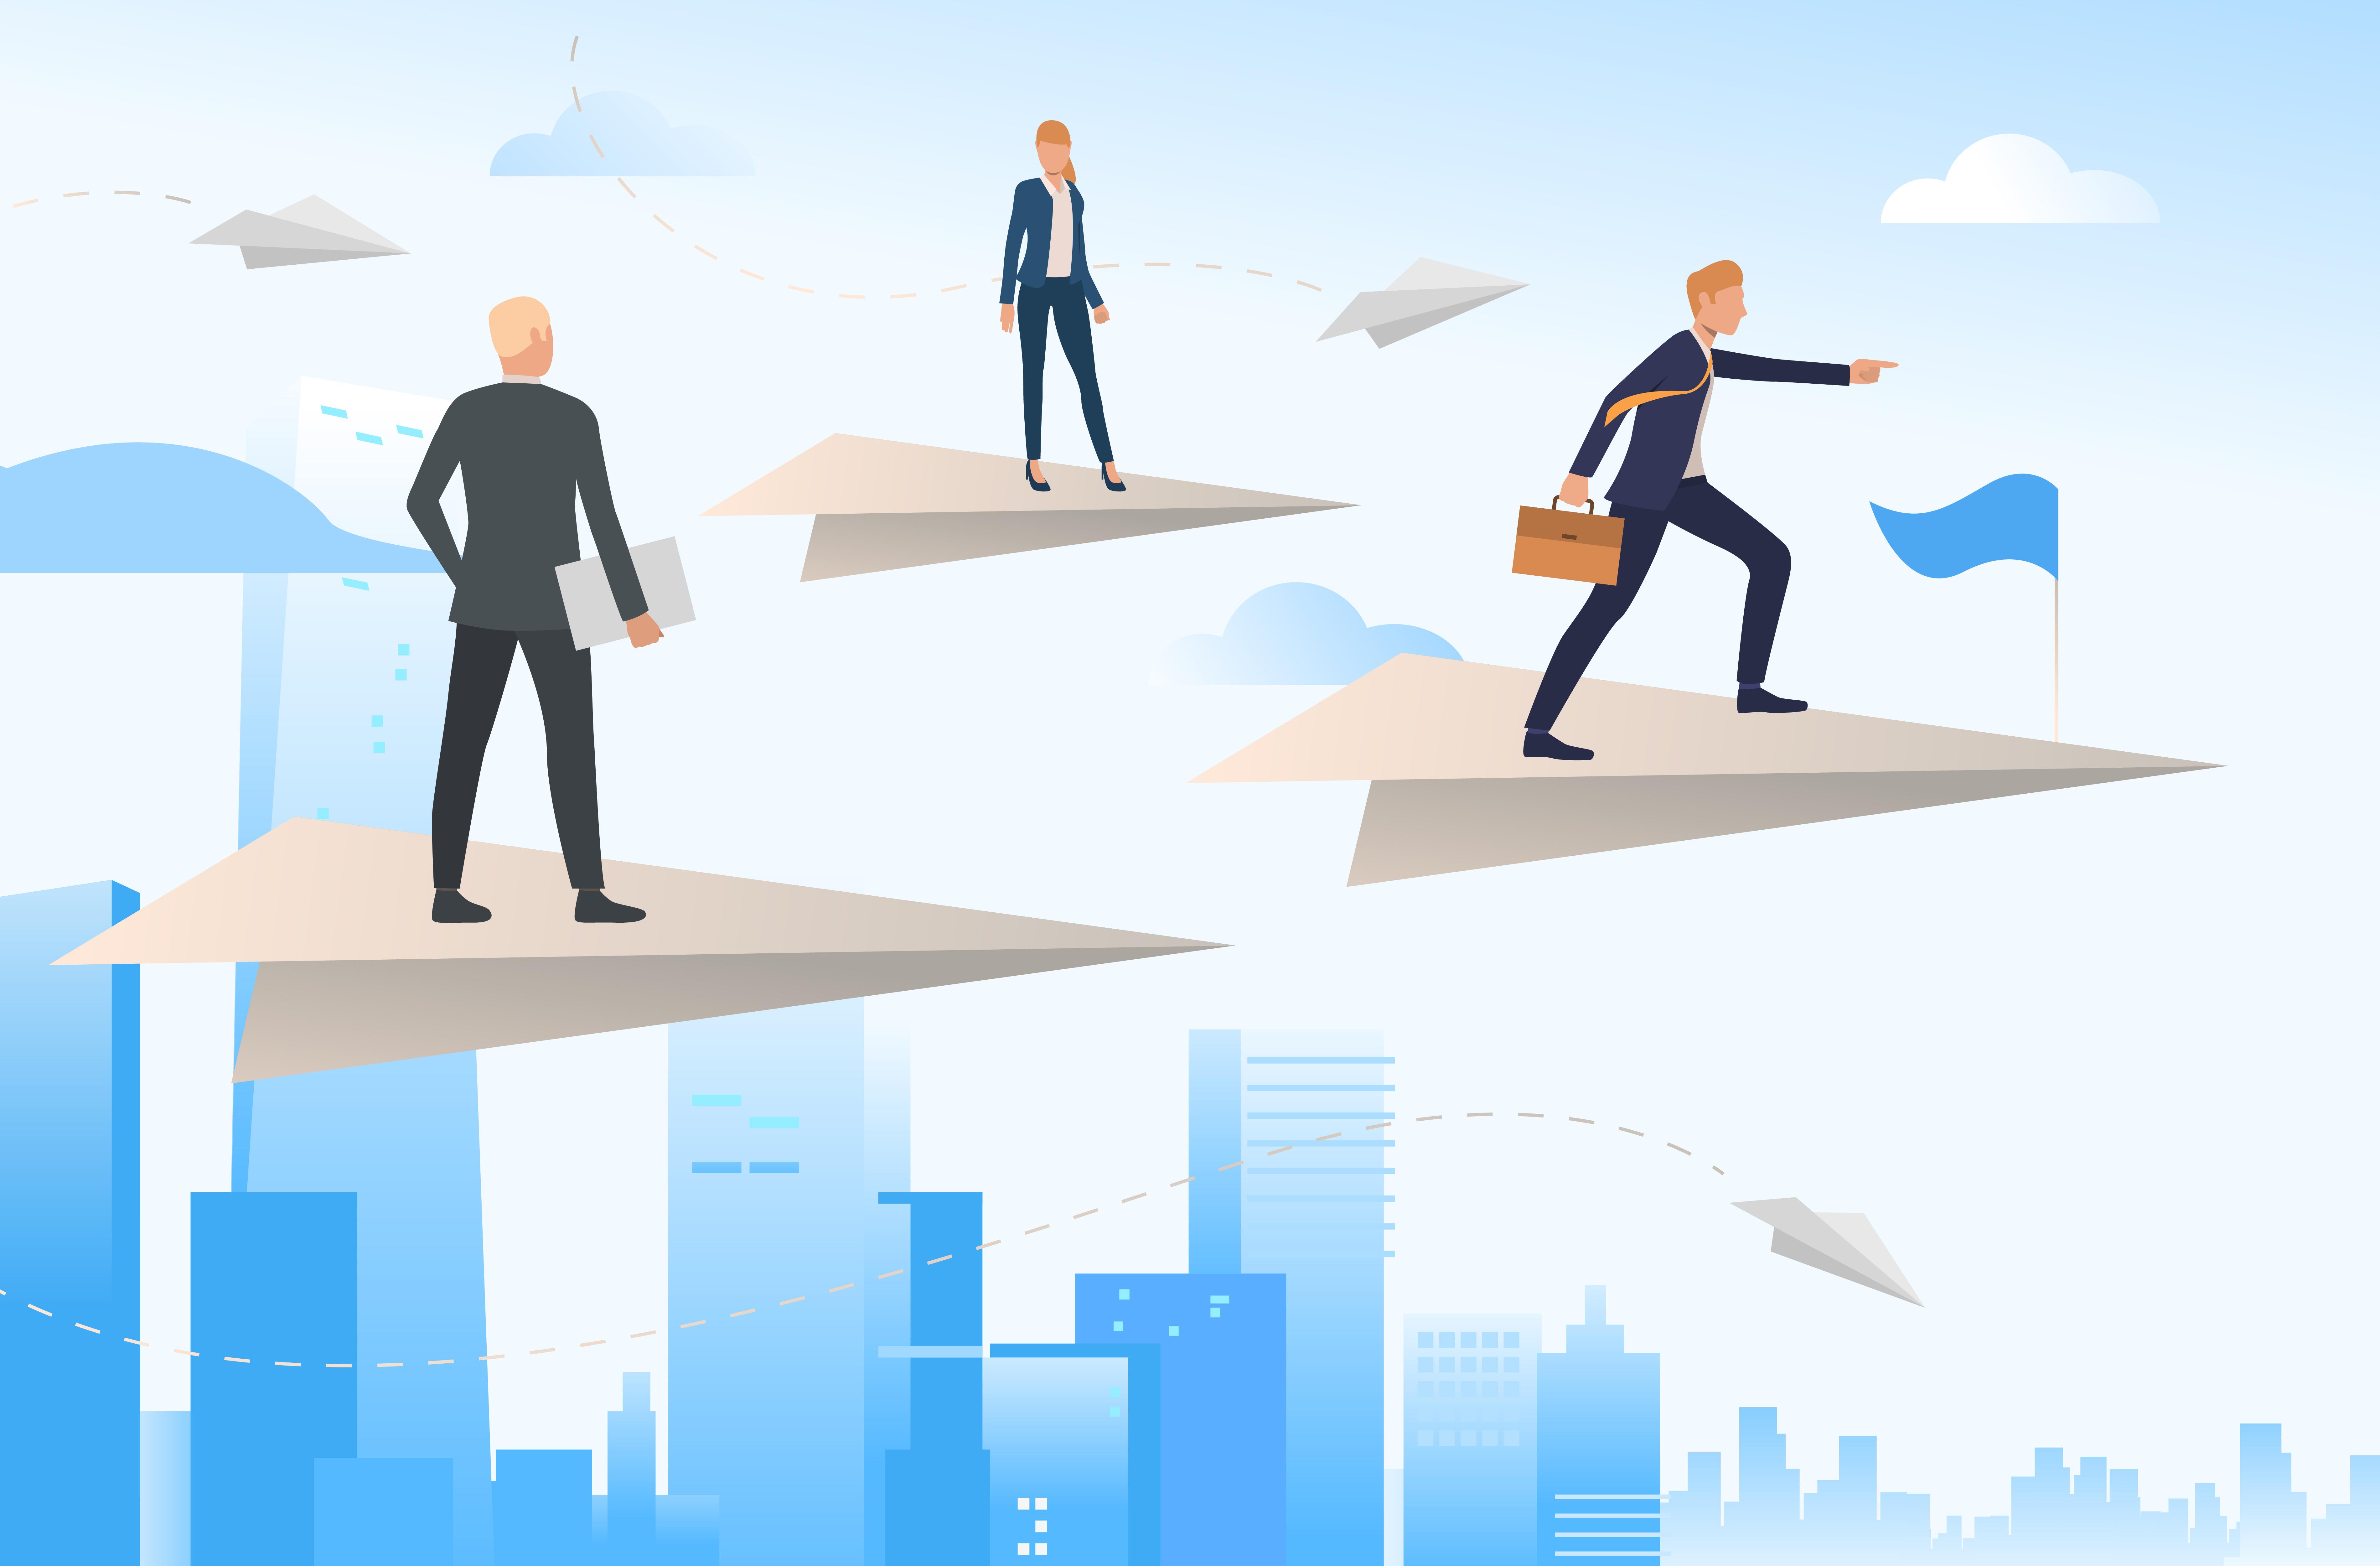 liderar-equipe-compras-a-distancia-home-office